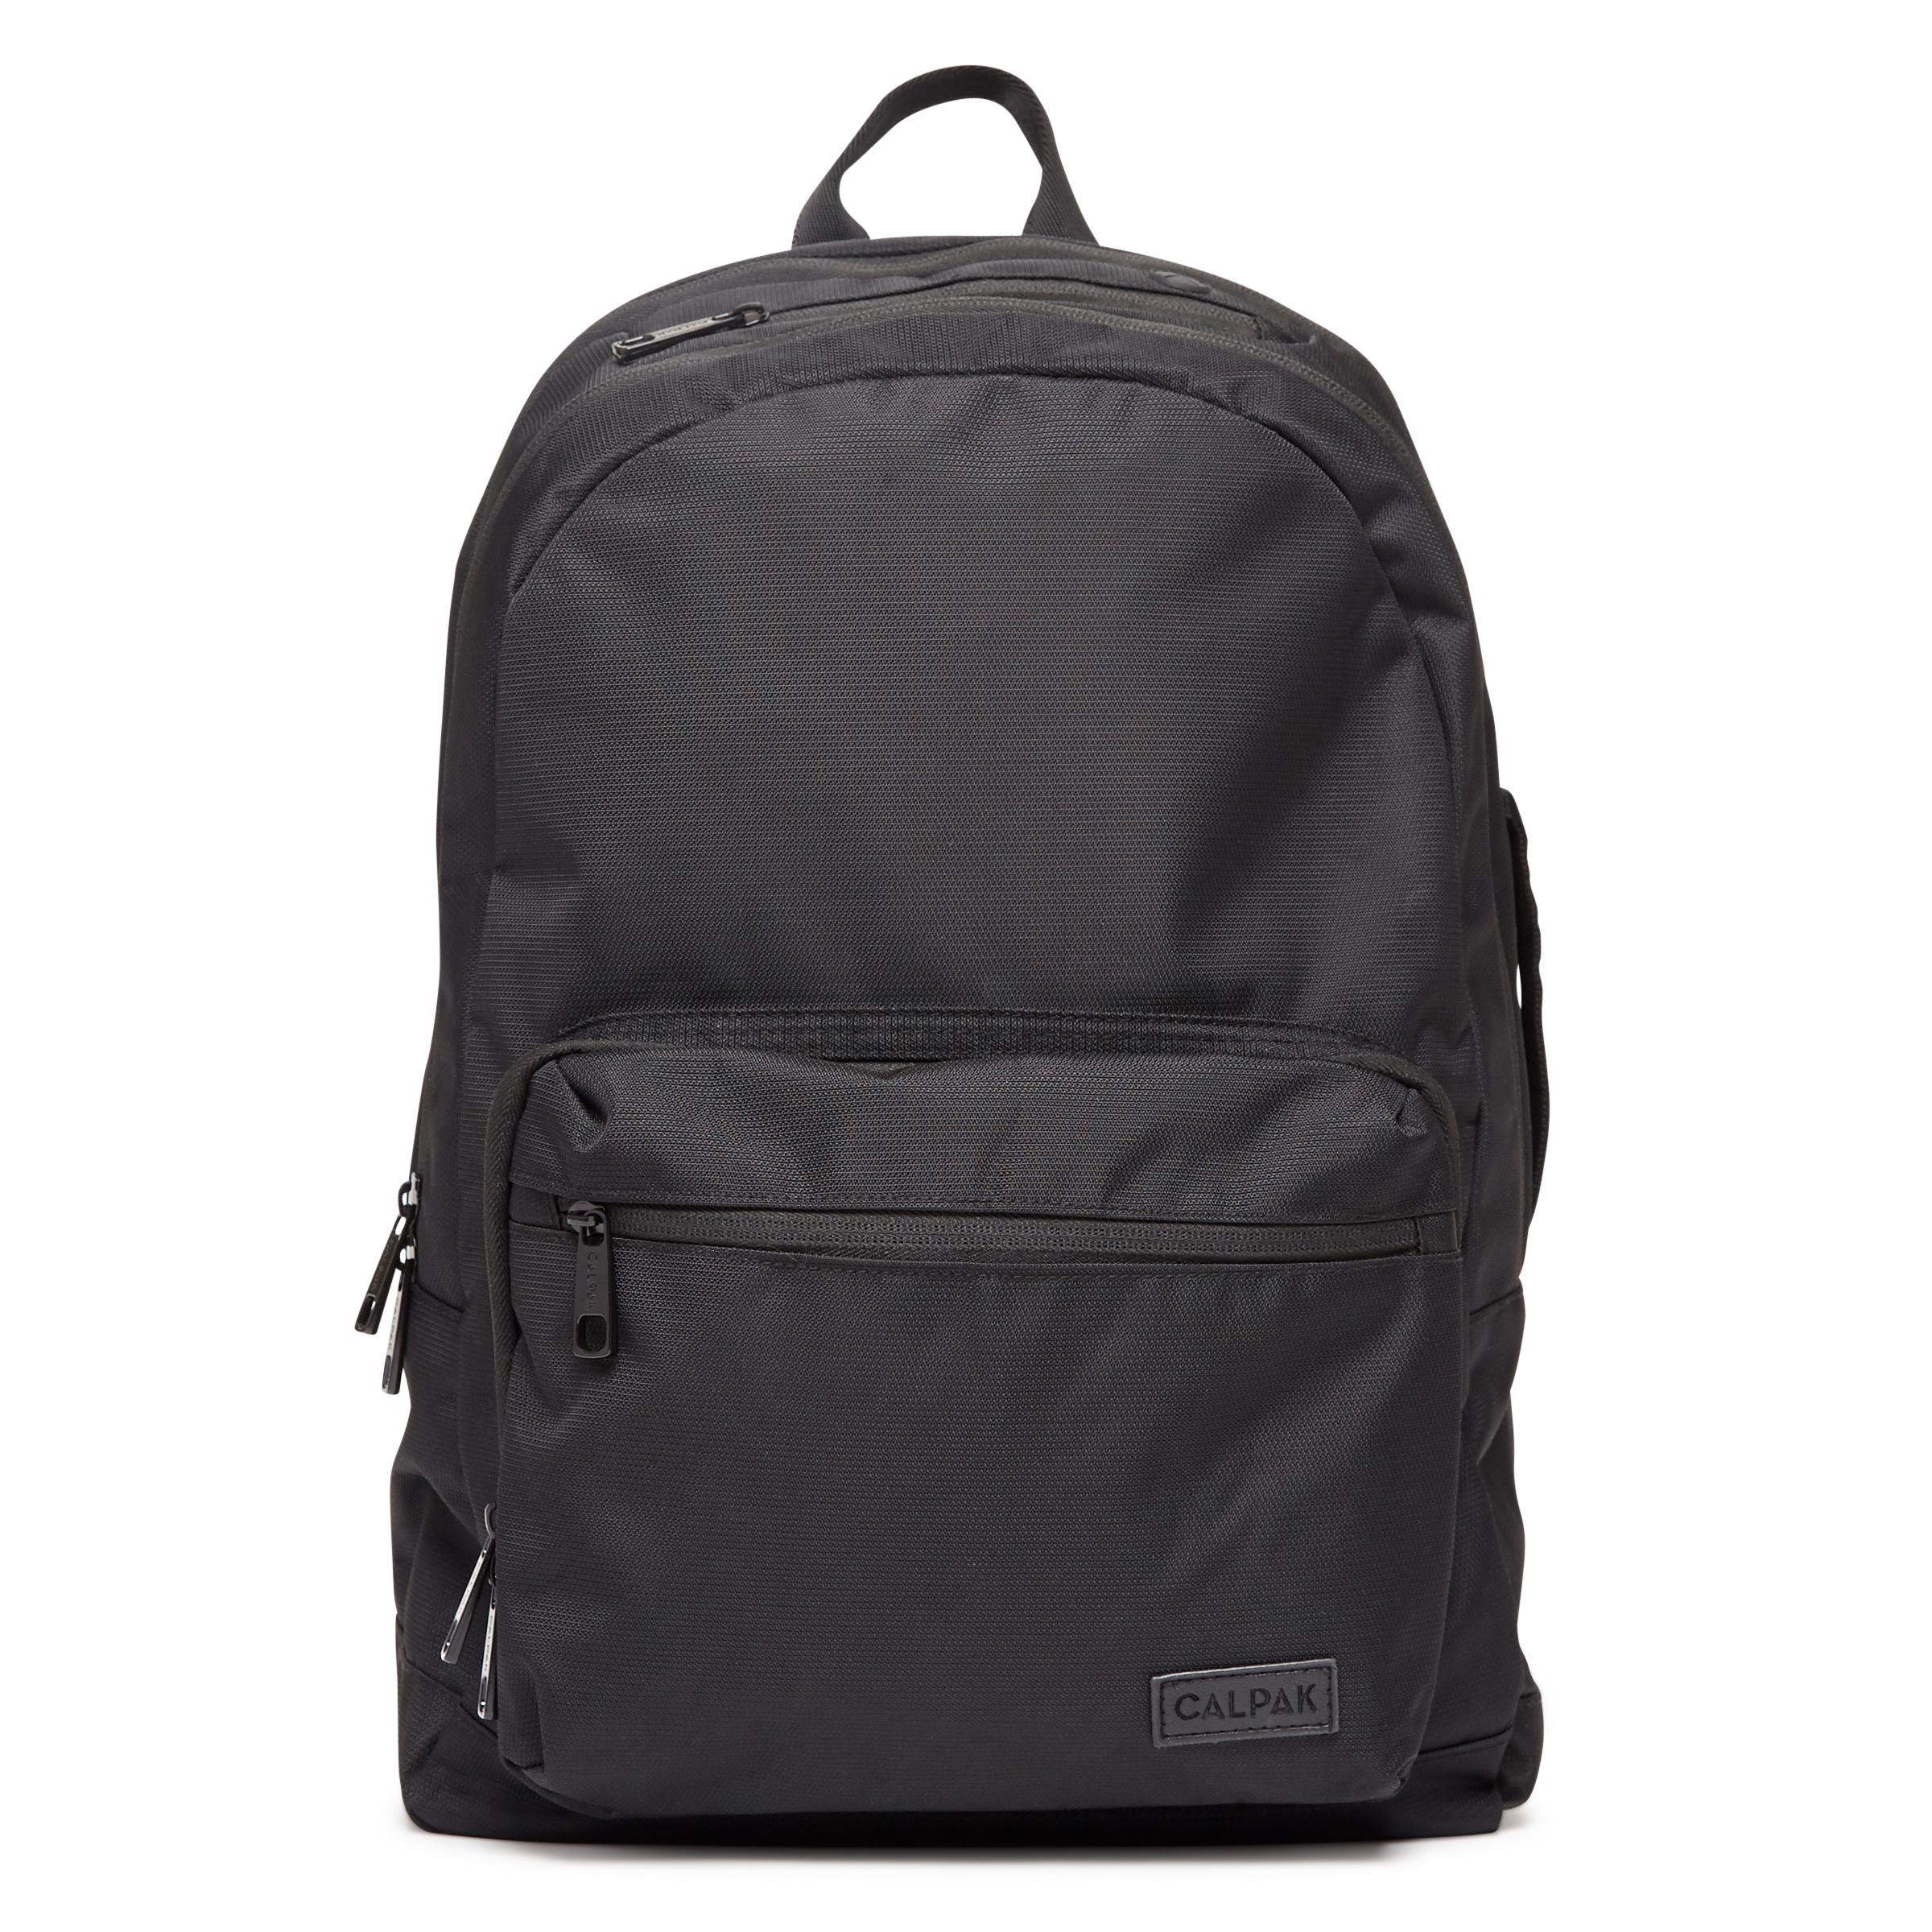 Glenroe Backpack - Black -